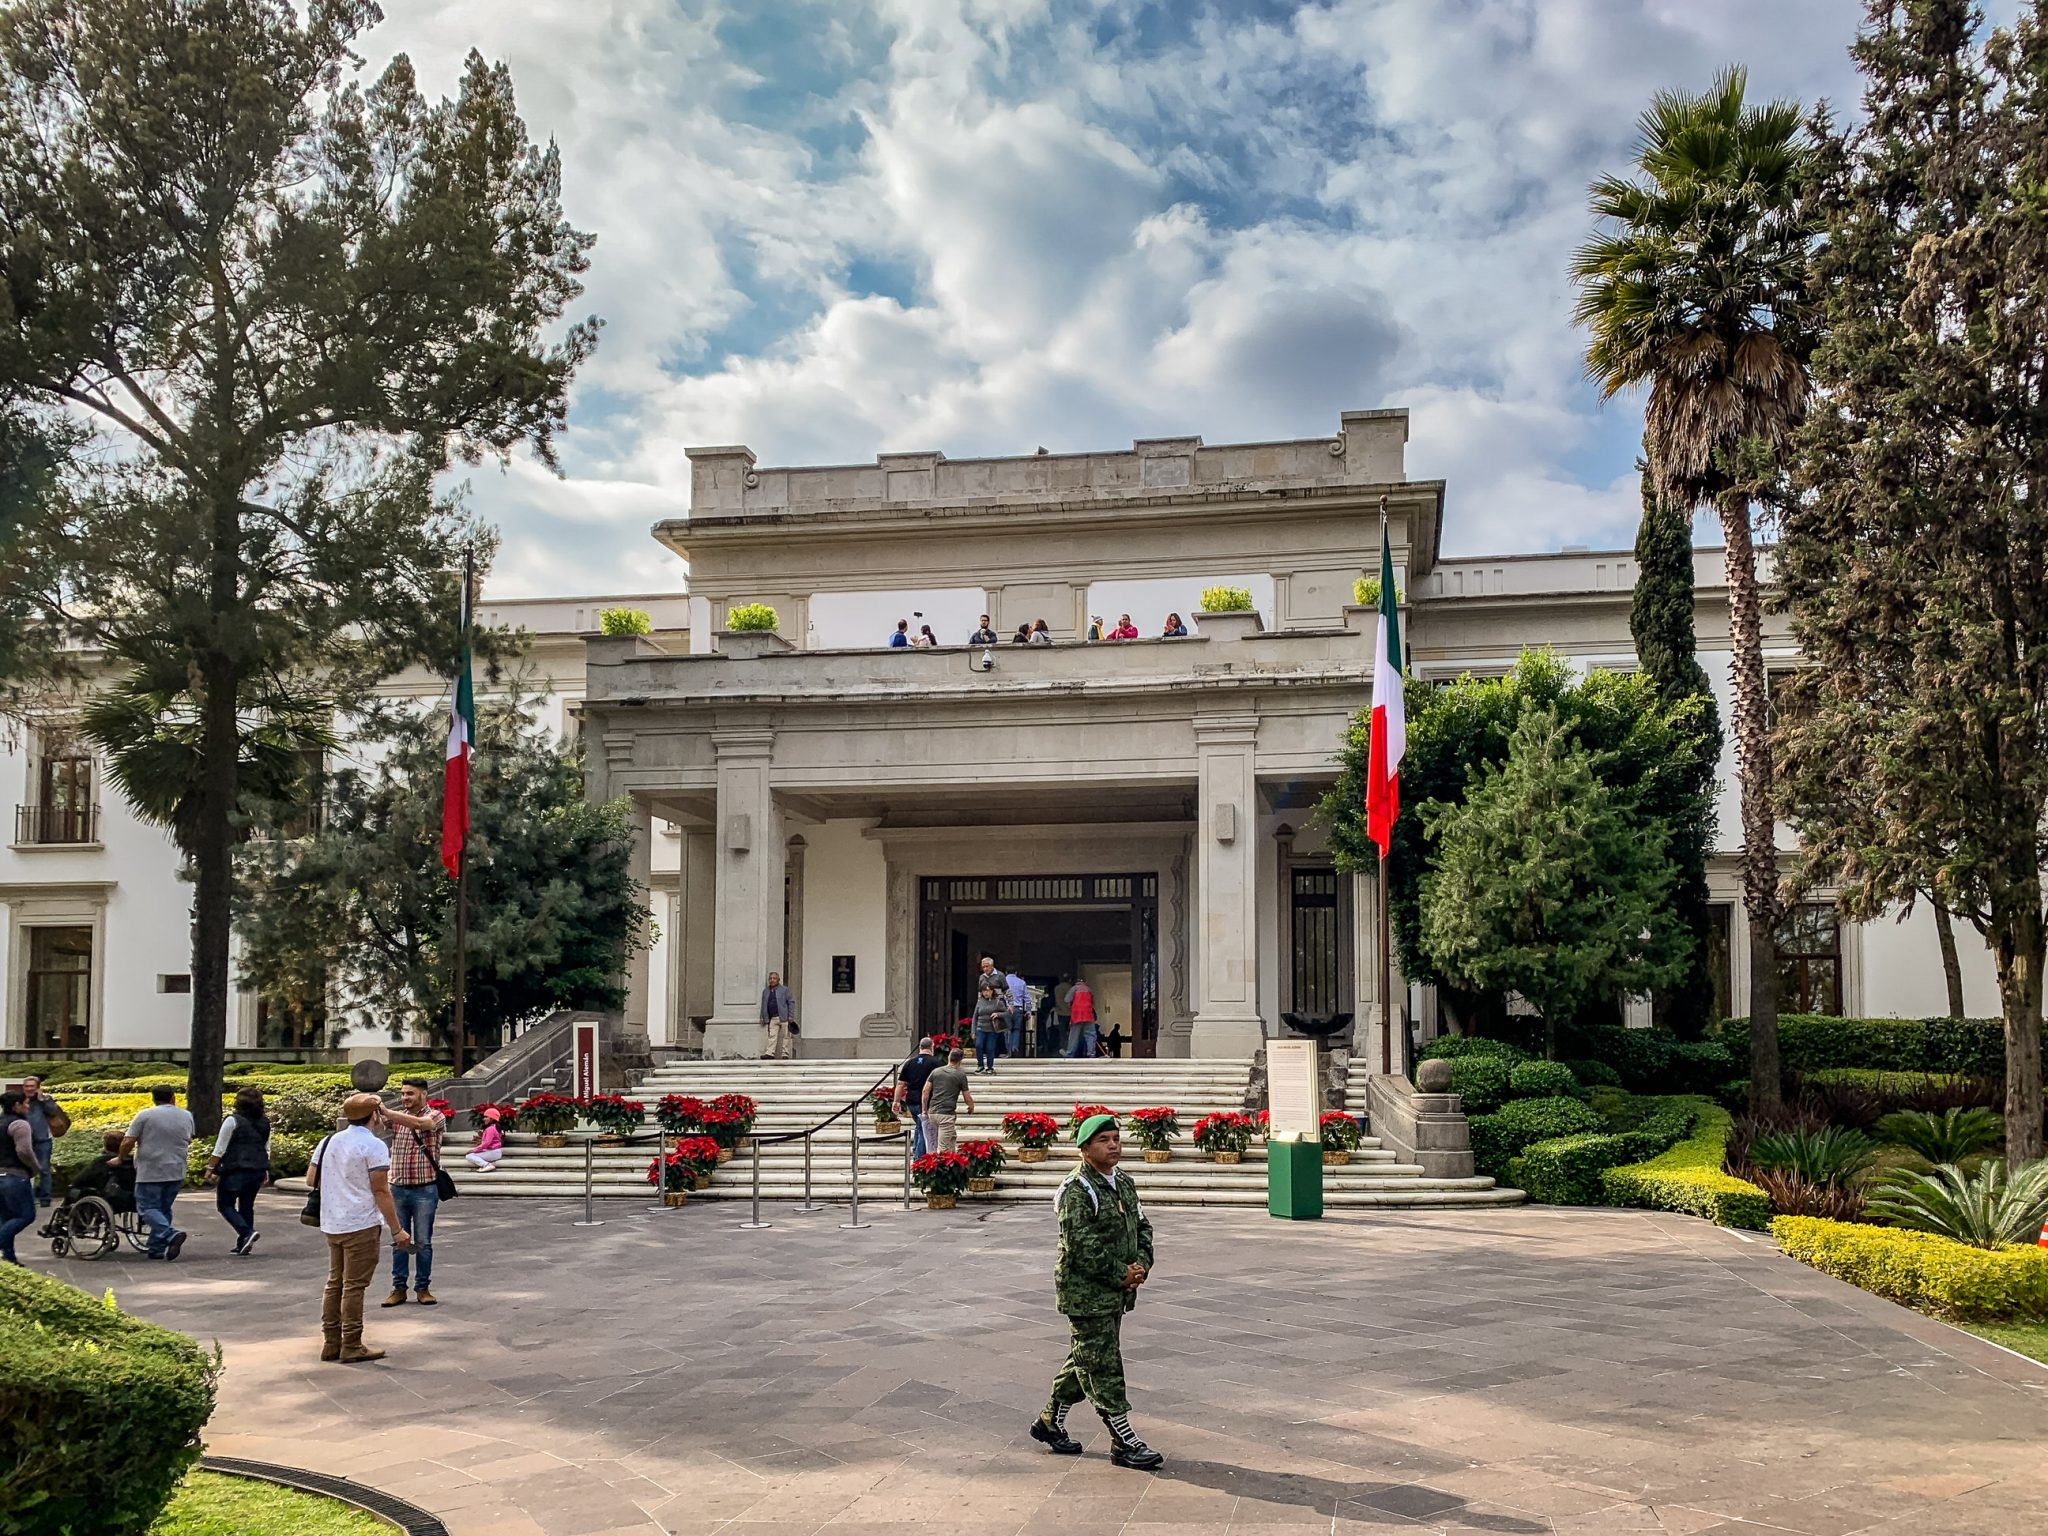 Bar, Felipe Calderon, Los Pinos - Conspiracción